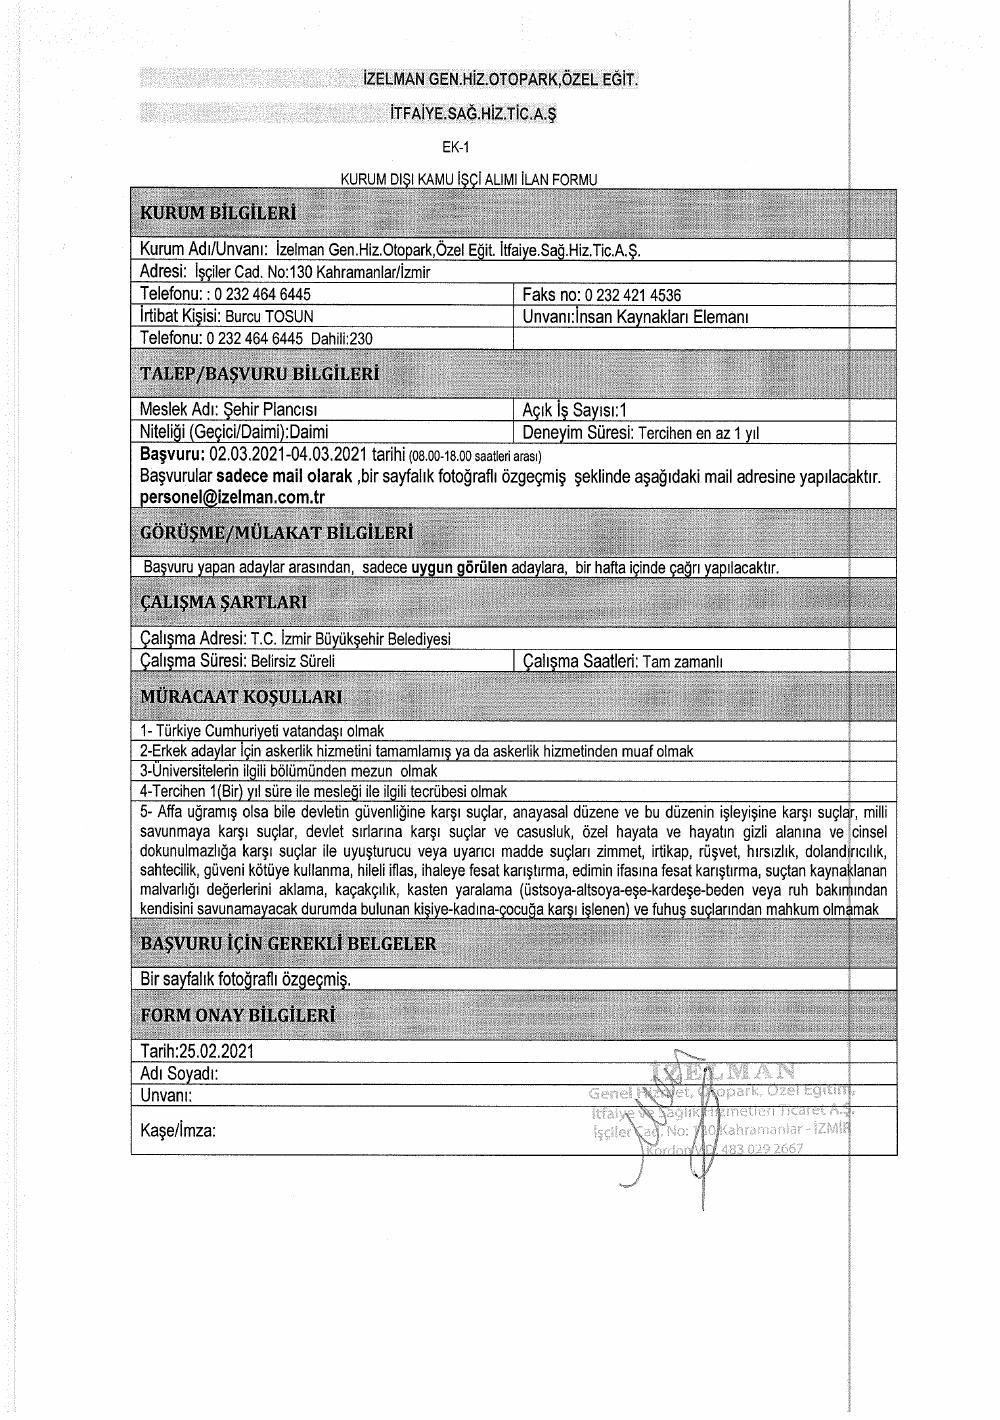 izmir-izelman-gen-hiz-tic-a-s-04-03-2021-000001.png